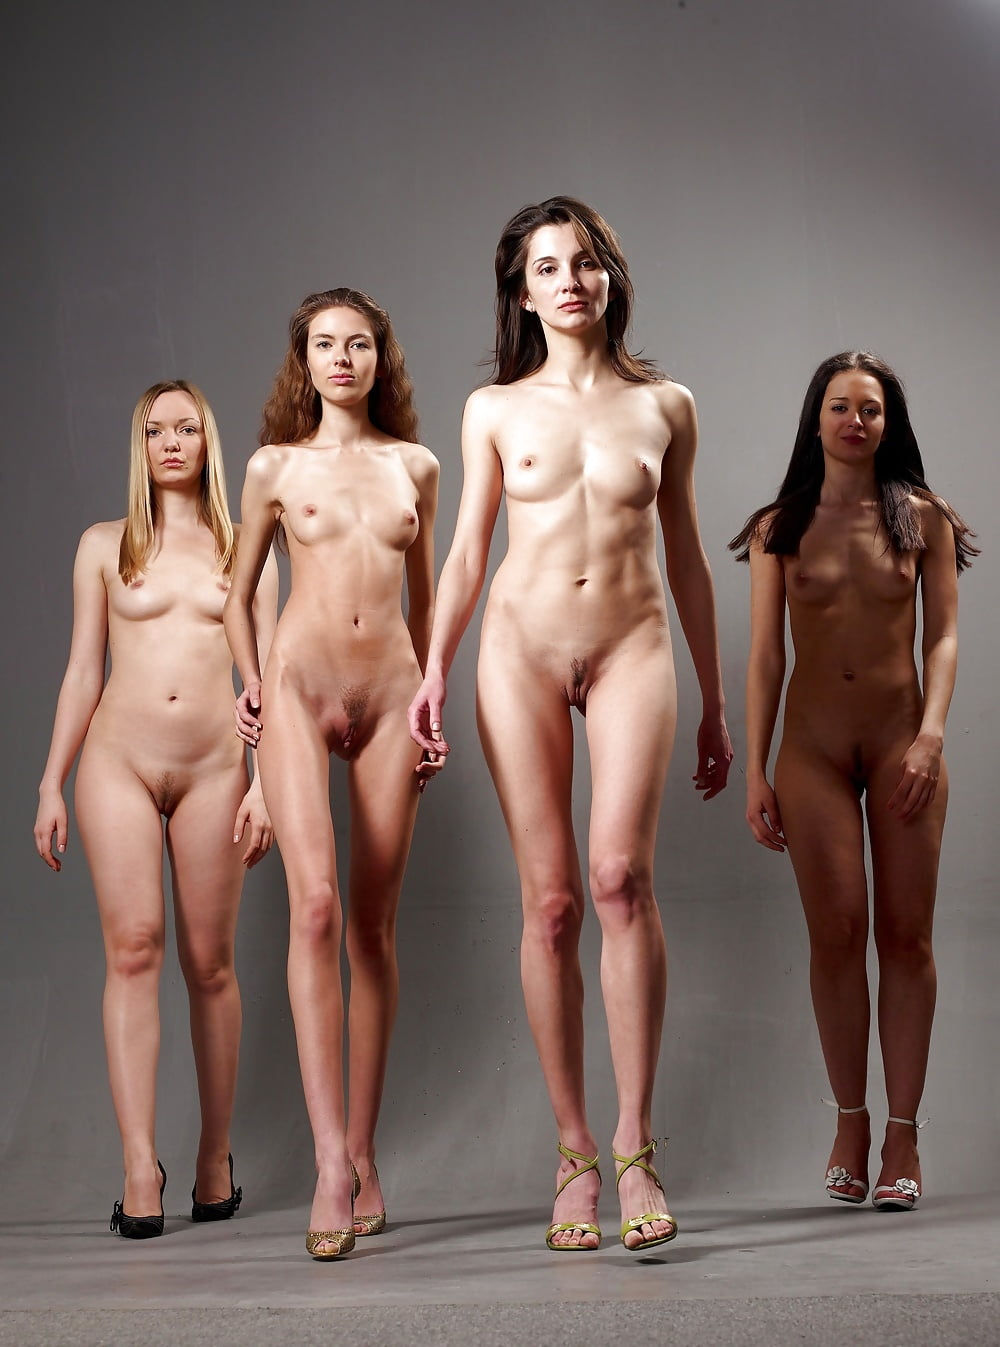 Very tall girl nude skinny woman